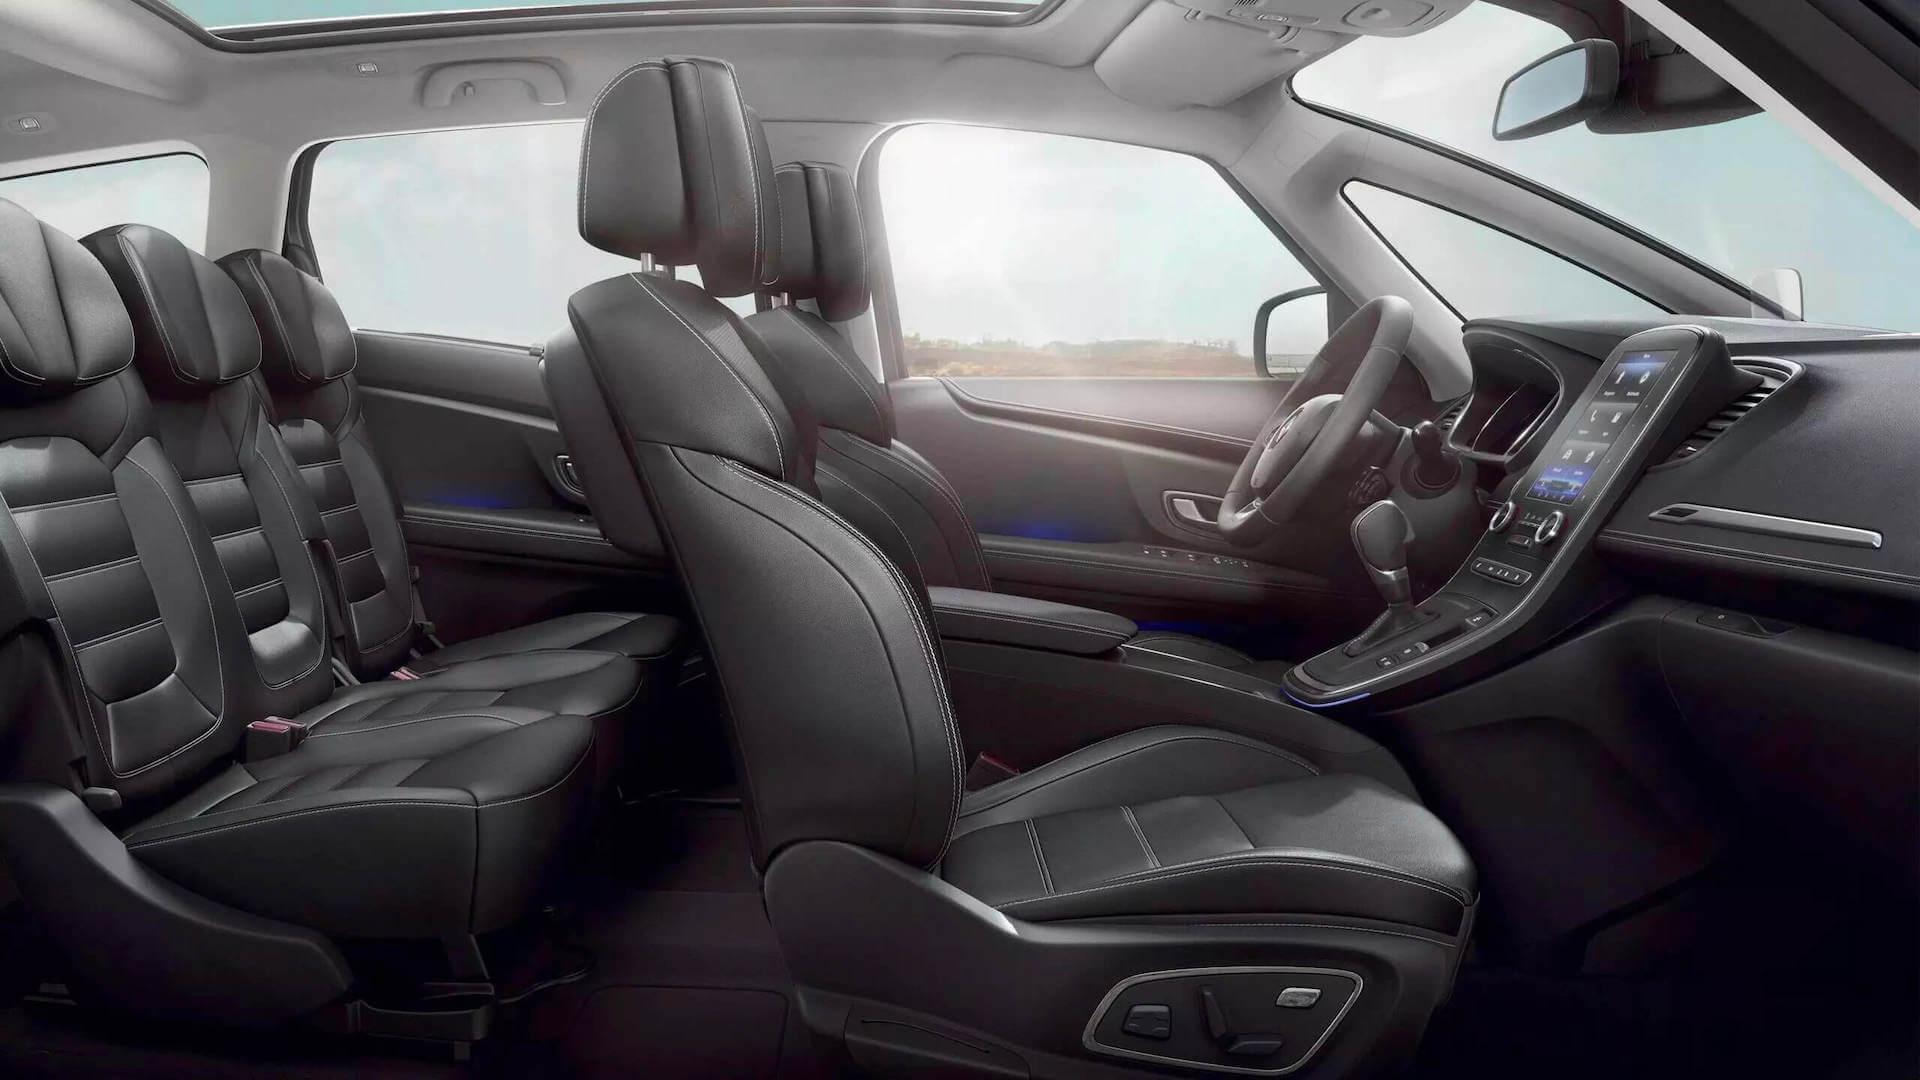 Autoansicht vom Innenraum - Renault Scenic - Renault Ahrens Hannover